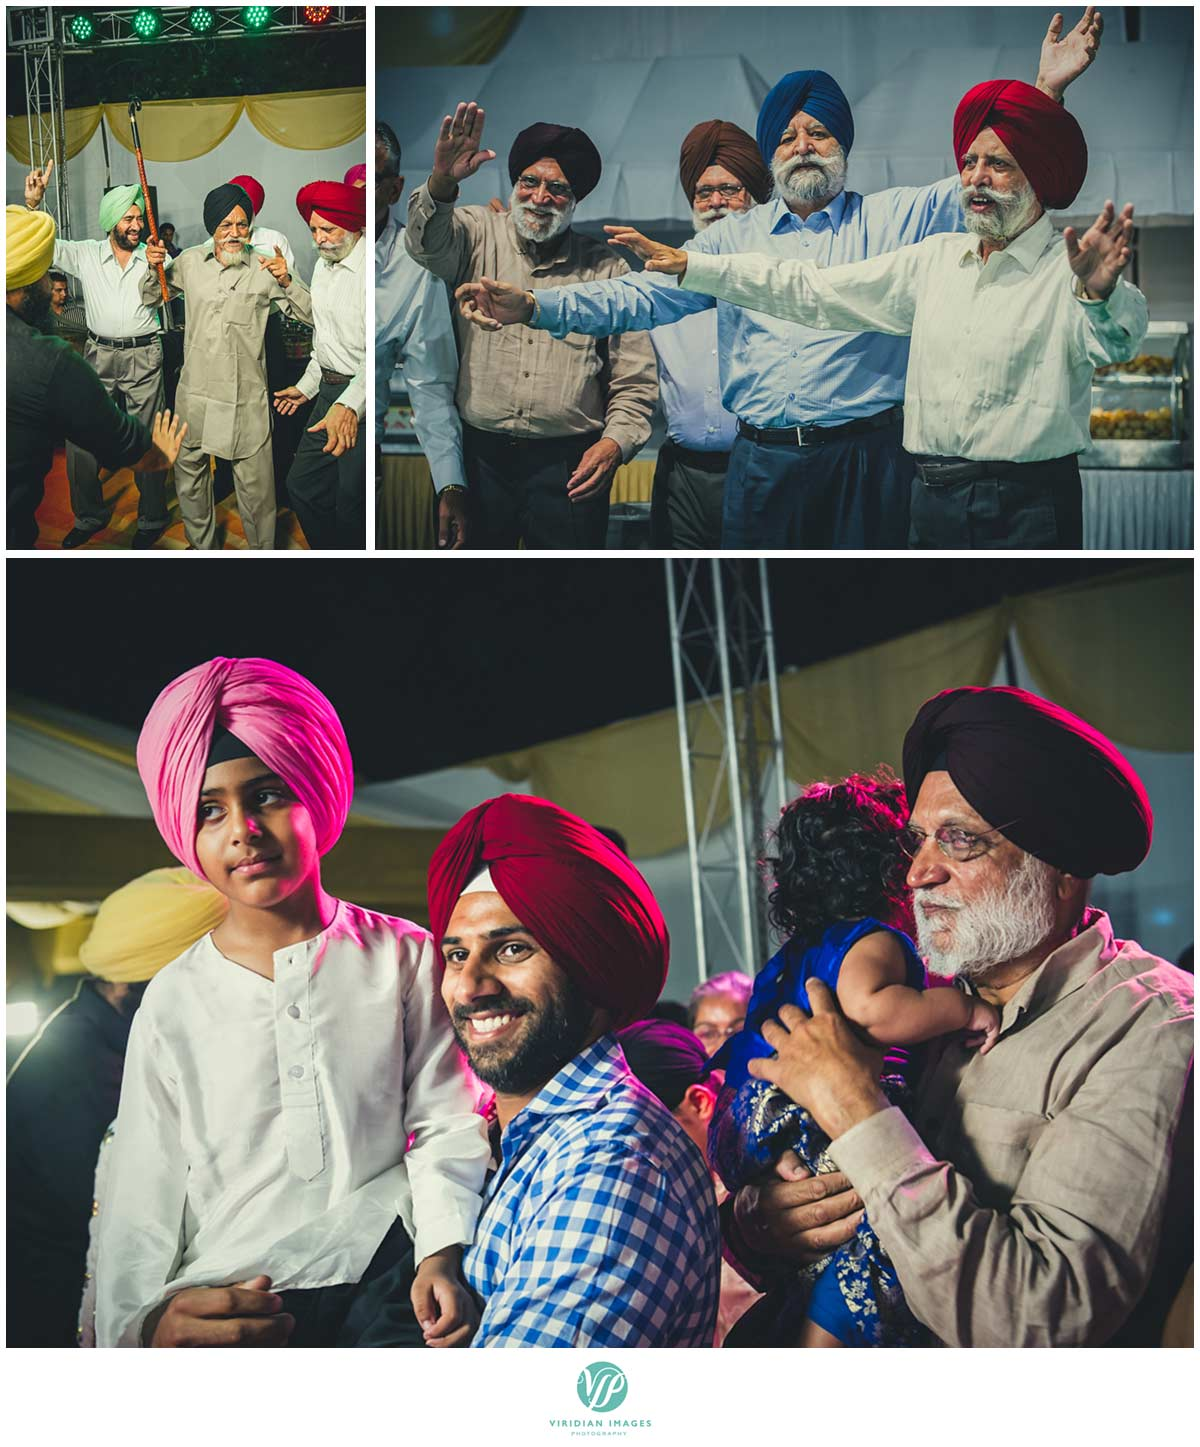 India_Chandigarh_Sangeet_Viridian_Images_Photography_poto_6